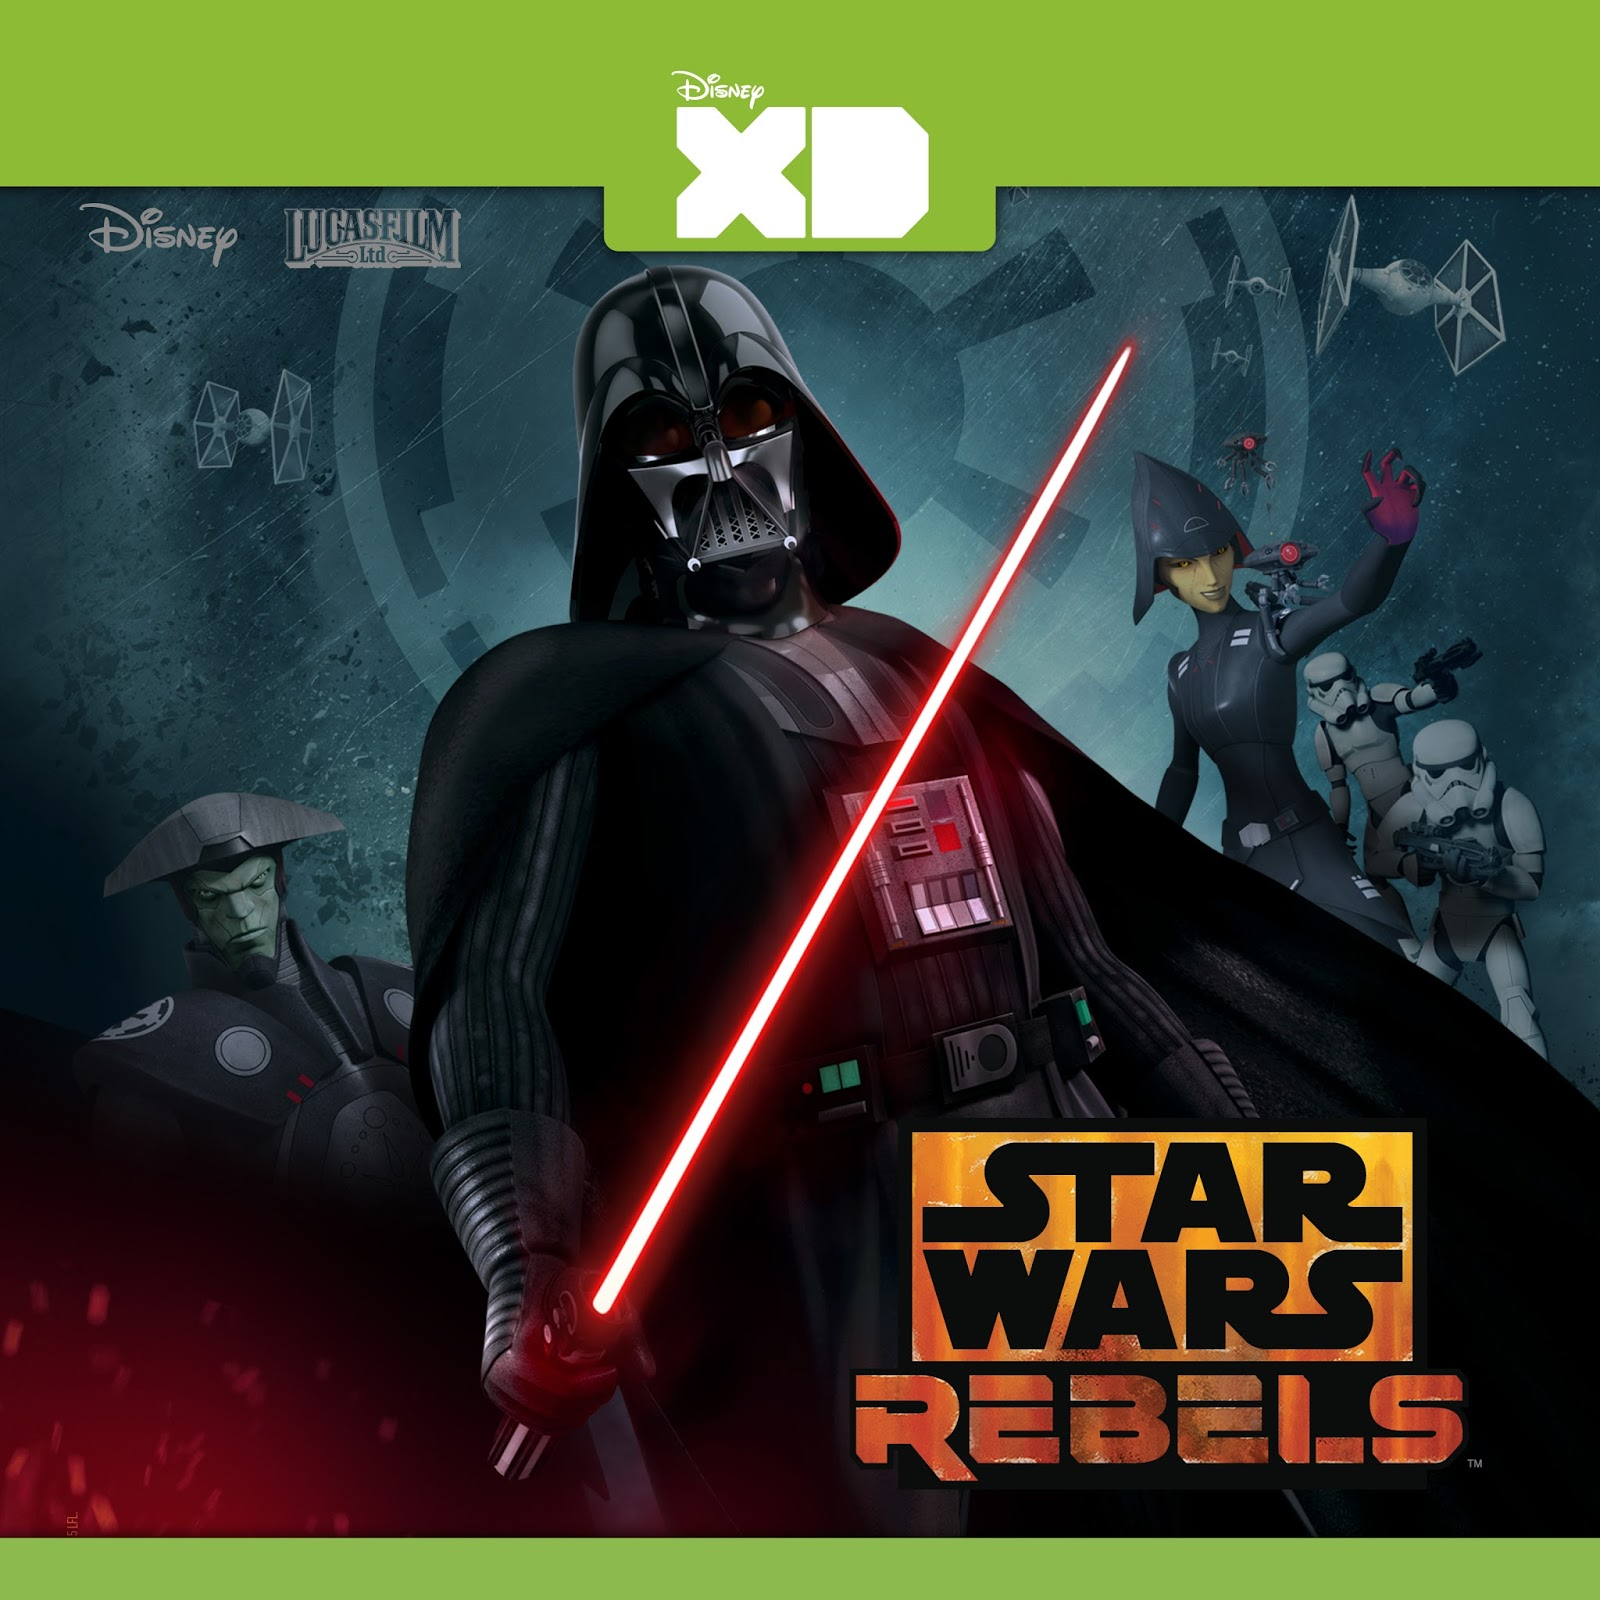 star wars rebels s04e07 download